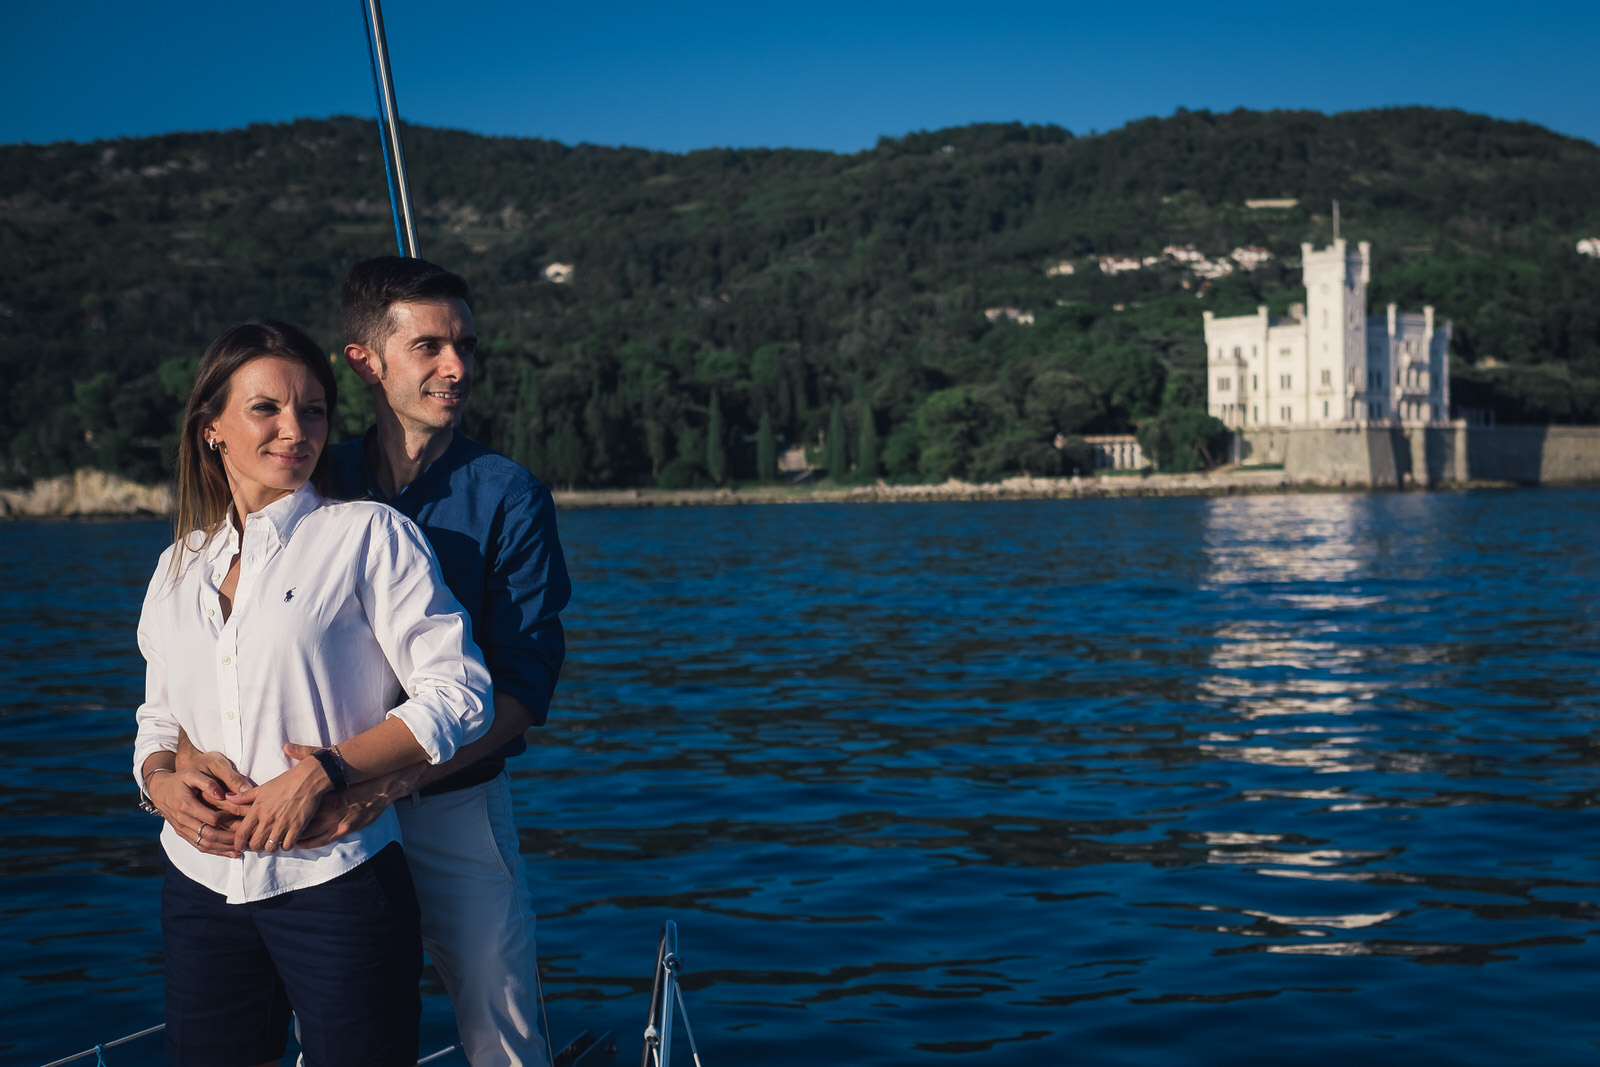 foto coppia in barca a vela trieste